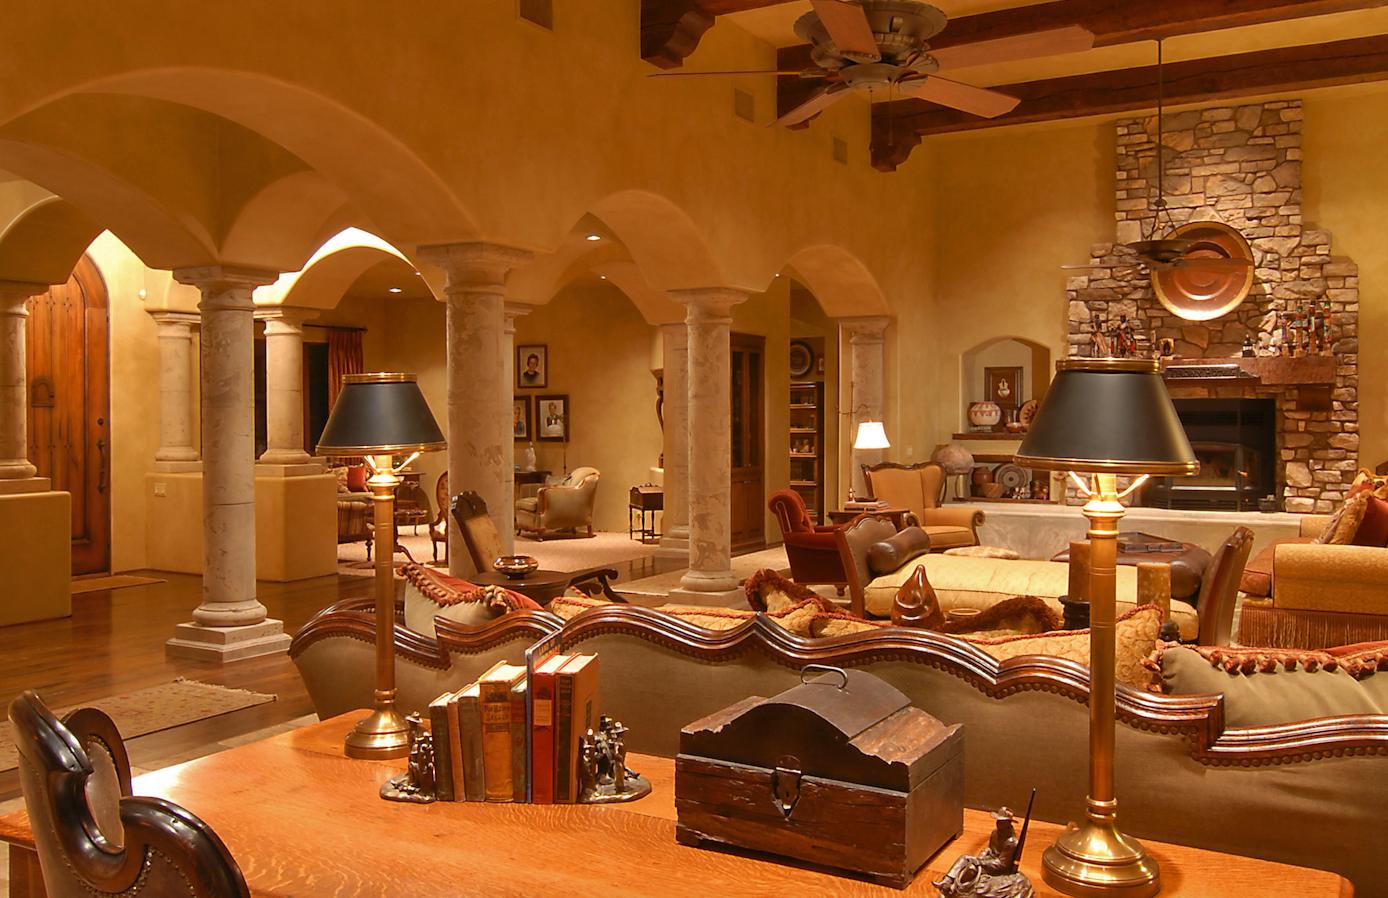 High Quality Arizona Ranch Estate, Arizona Interior Design, Interior Design,  Construction Remodel, Kitchen Remodel